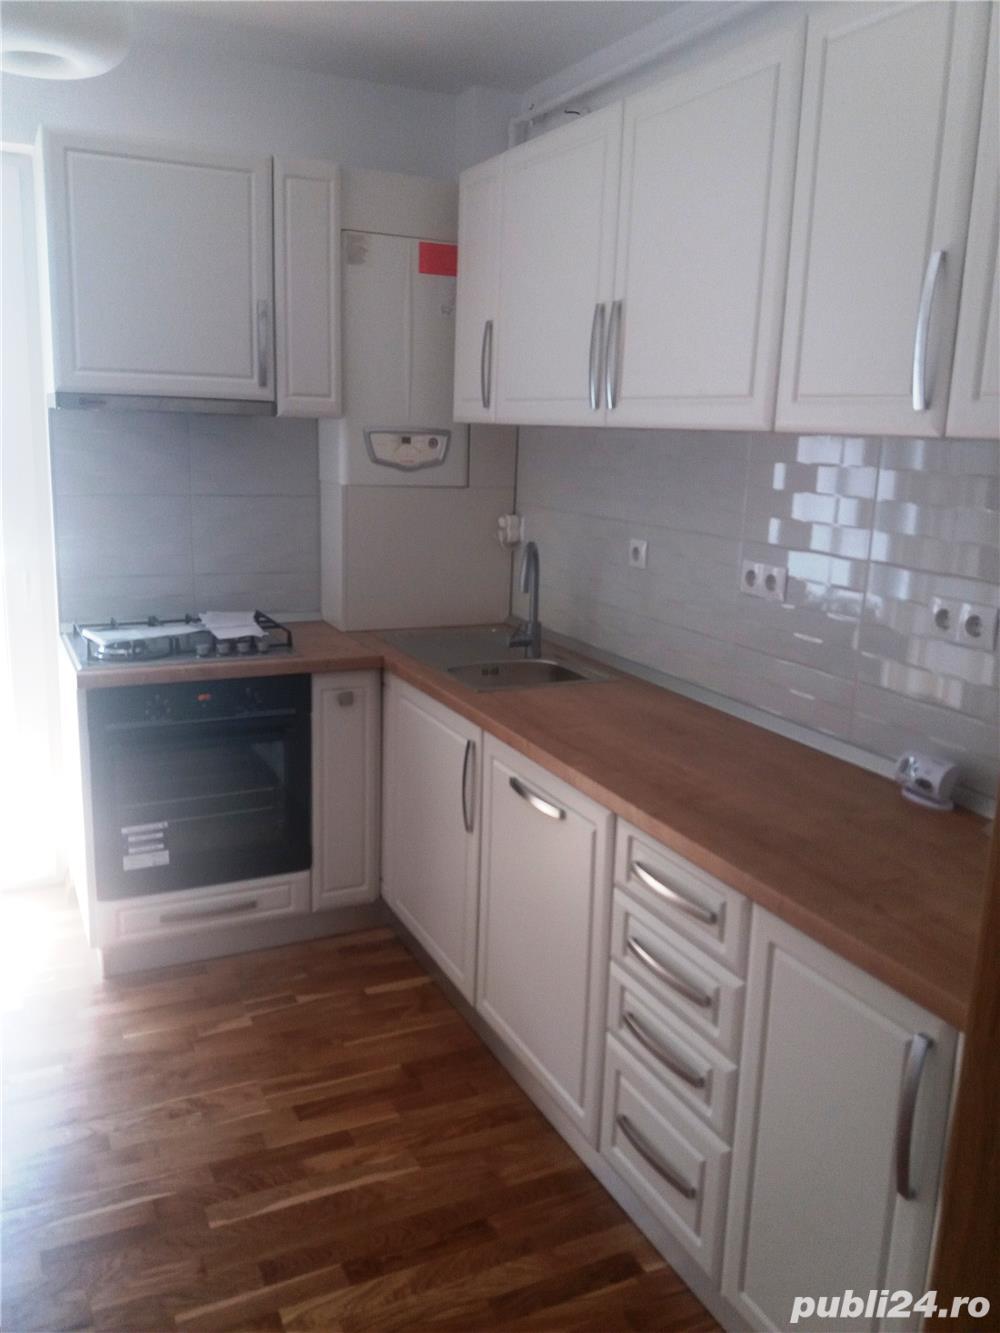 INCHIRIEZ apartament 3 camere nemobilat cu garaj ,zona Turnisor